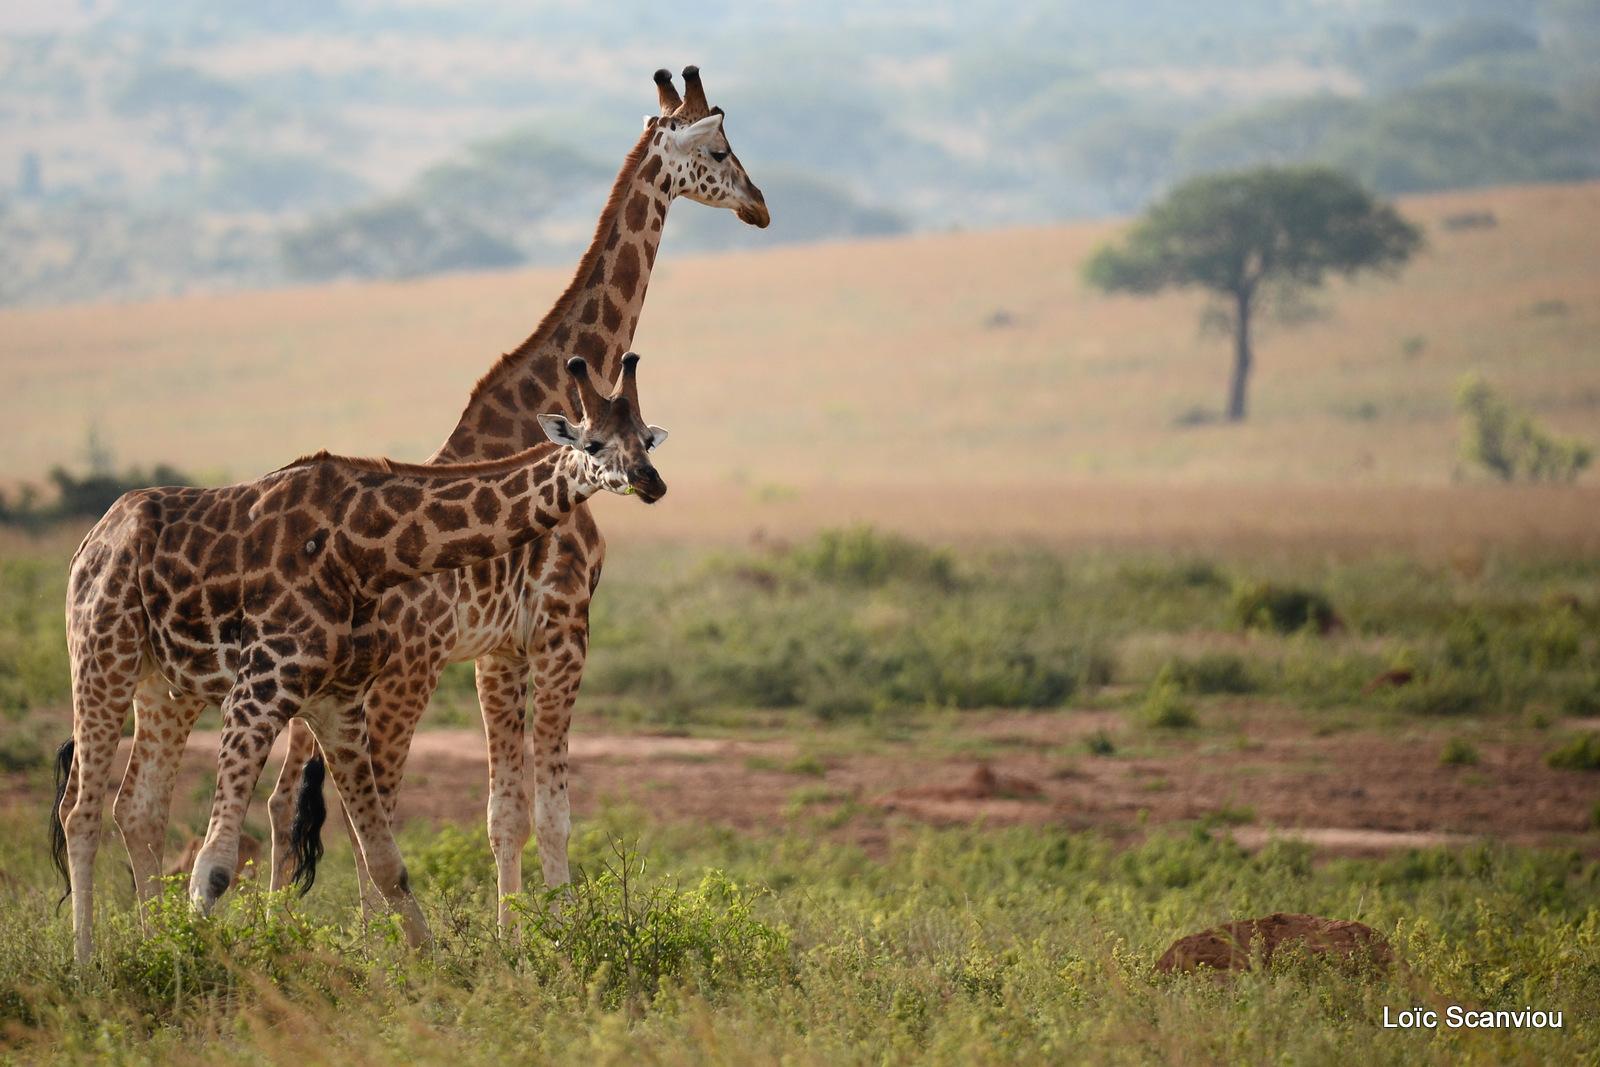 Girafe de Rothschild/Rothschild's Giraffe (18)